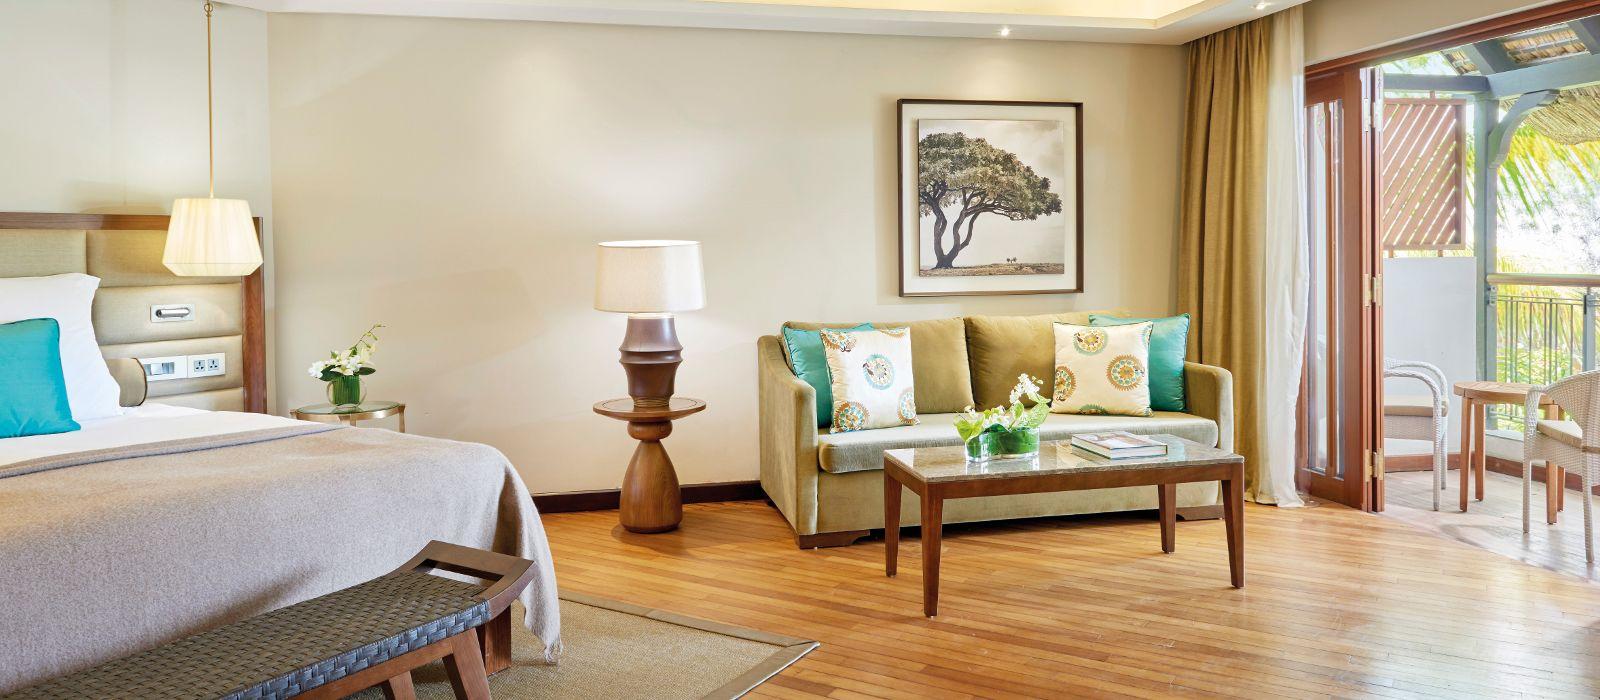 Hotel Beachcomber Royal Palm Mauritius